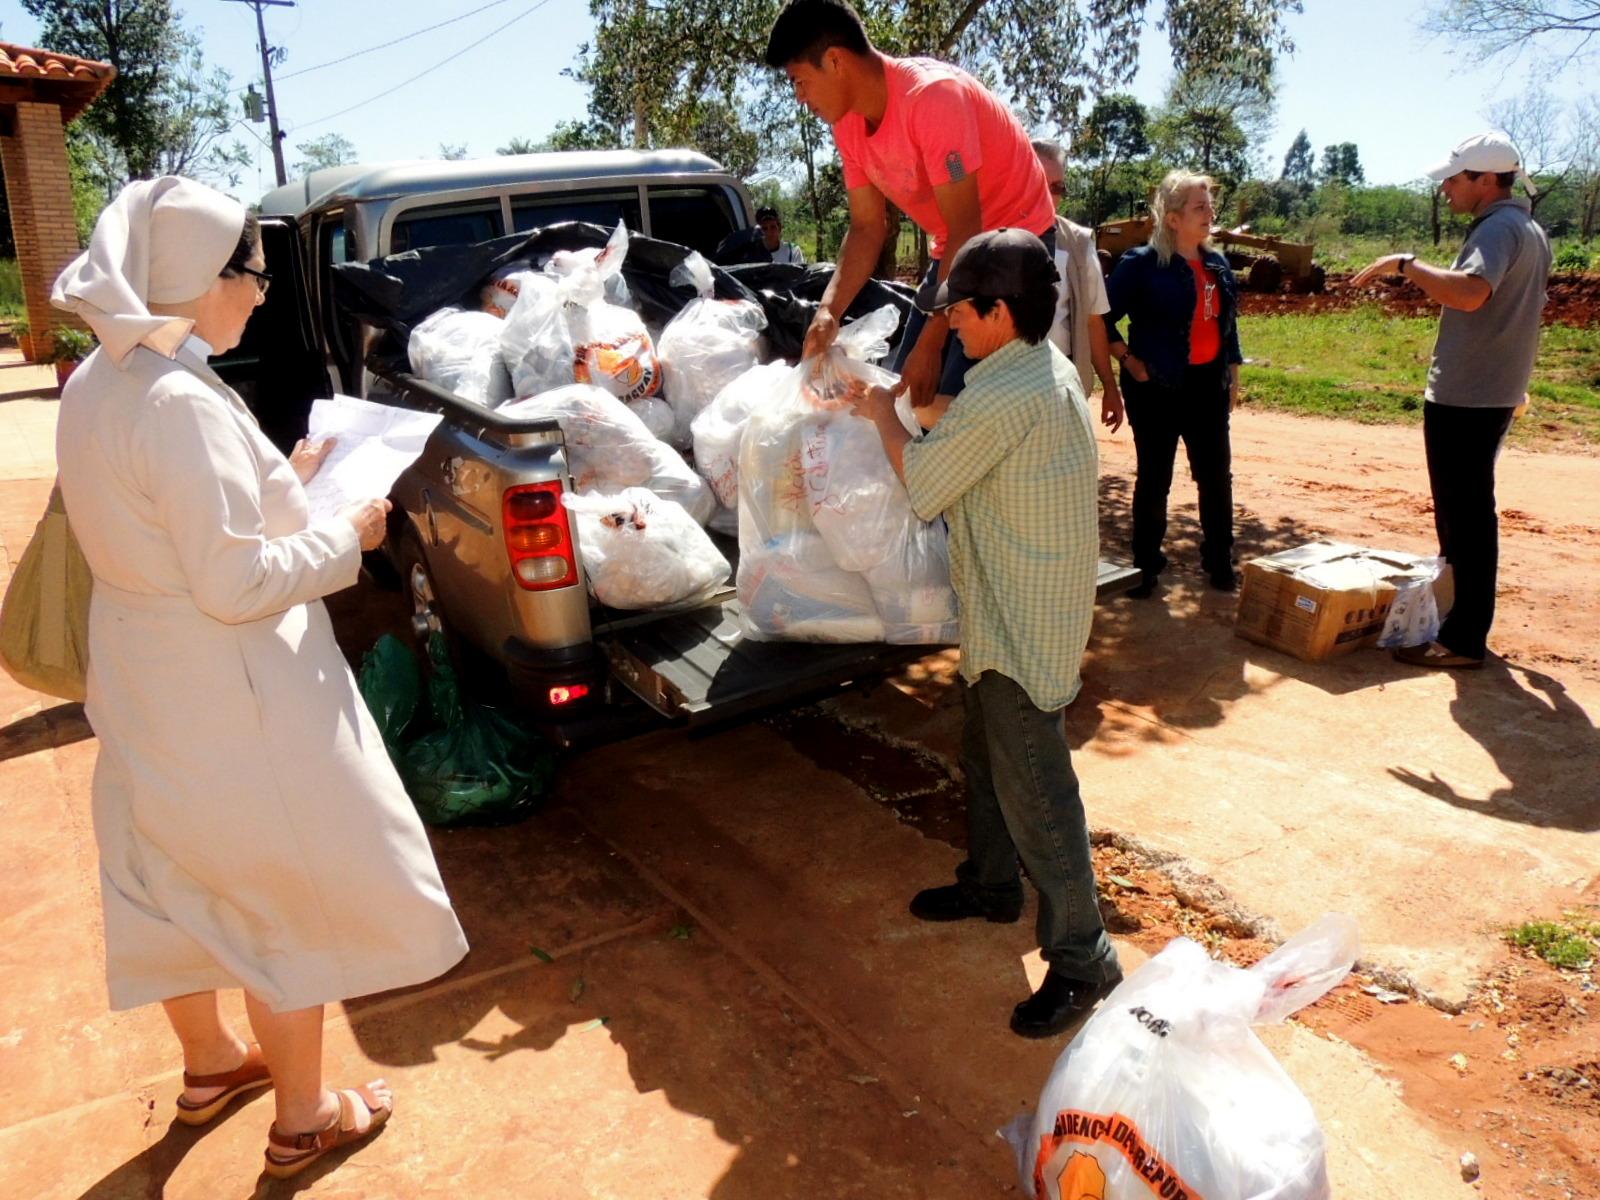 CAS entregó kits de víveres a 2 comunidades de la ATPO